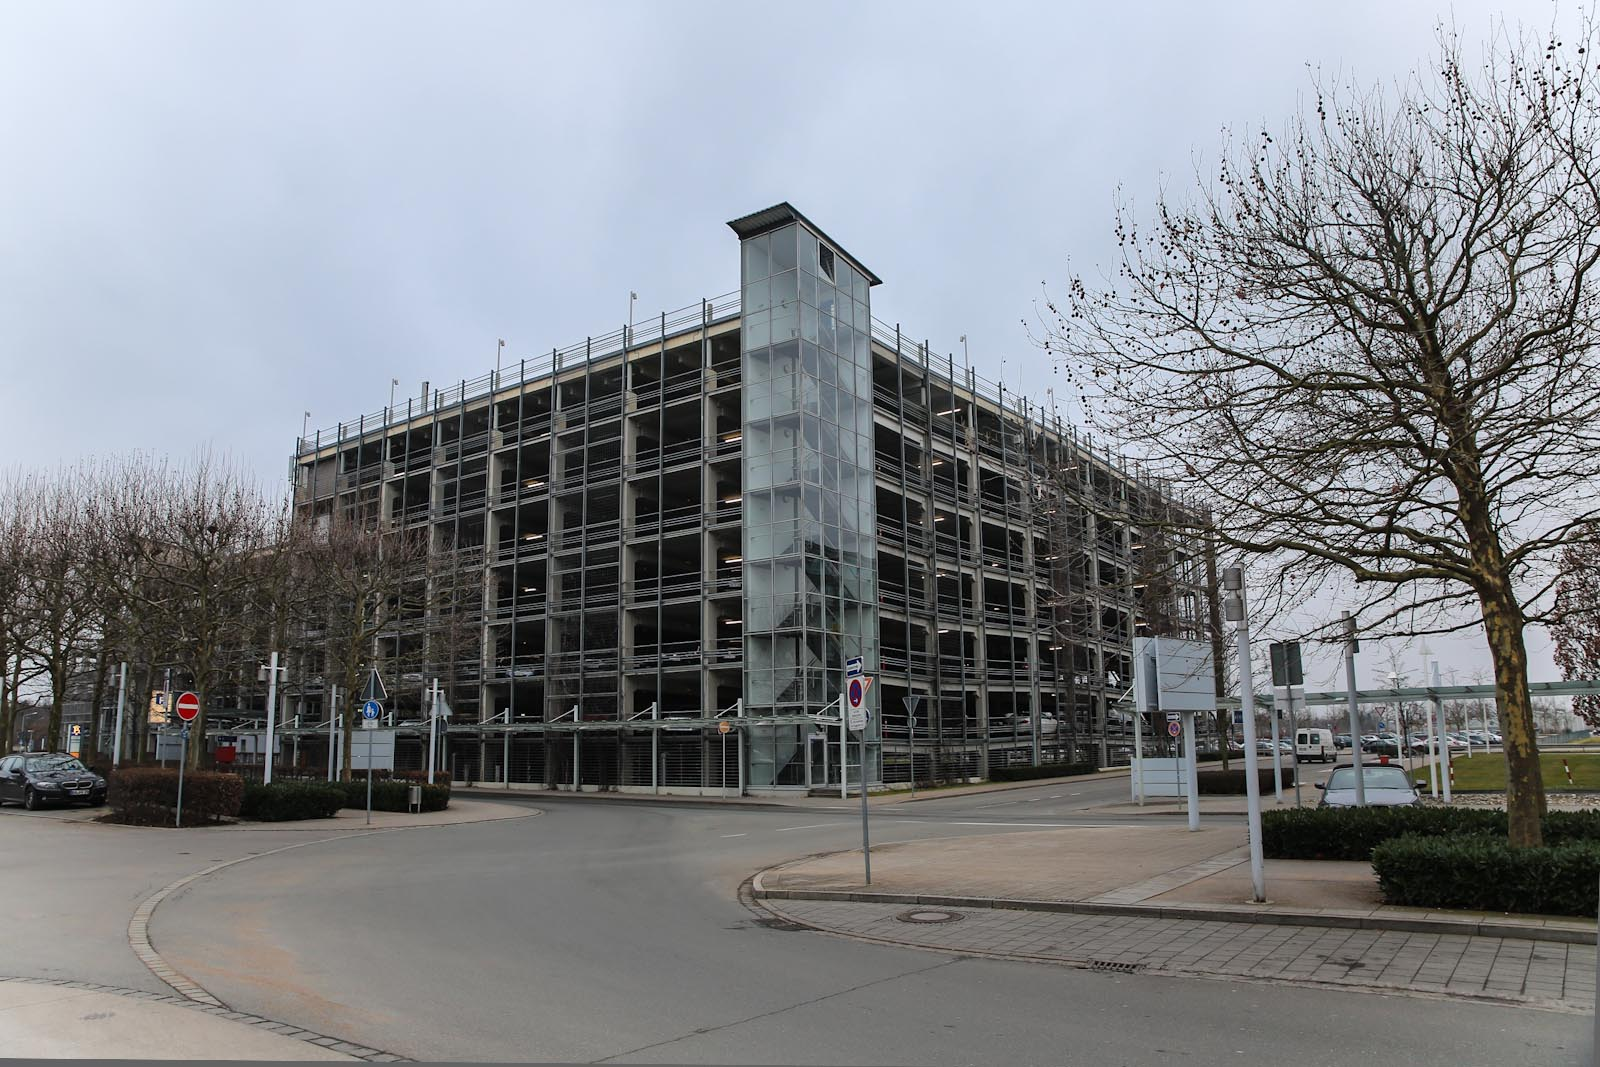 Автомобильная парковка в аэропорту Нюрнберг